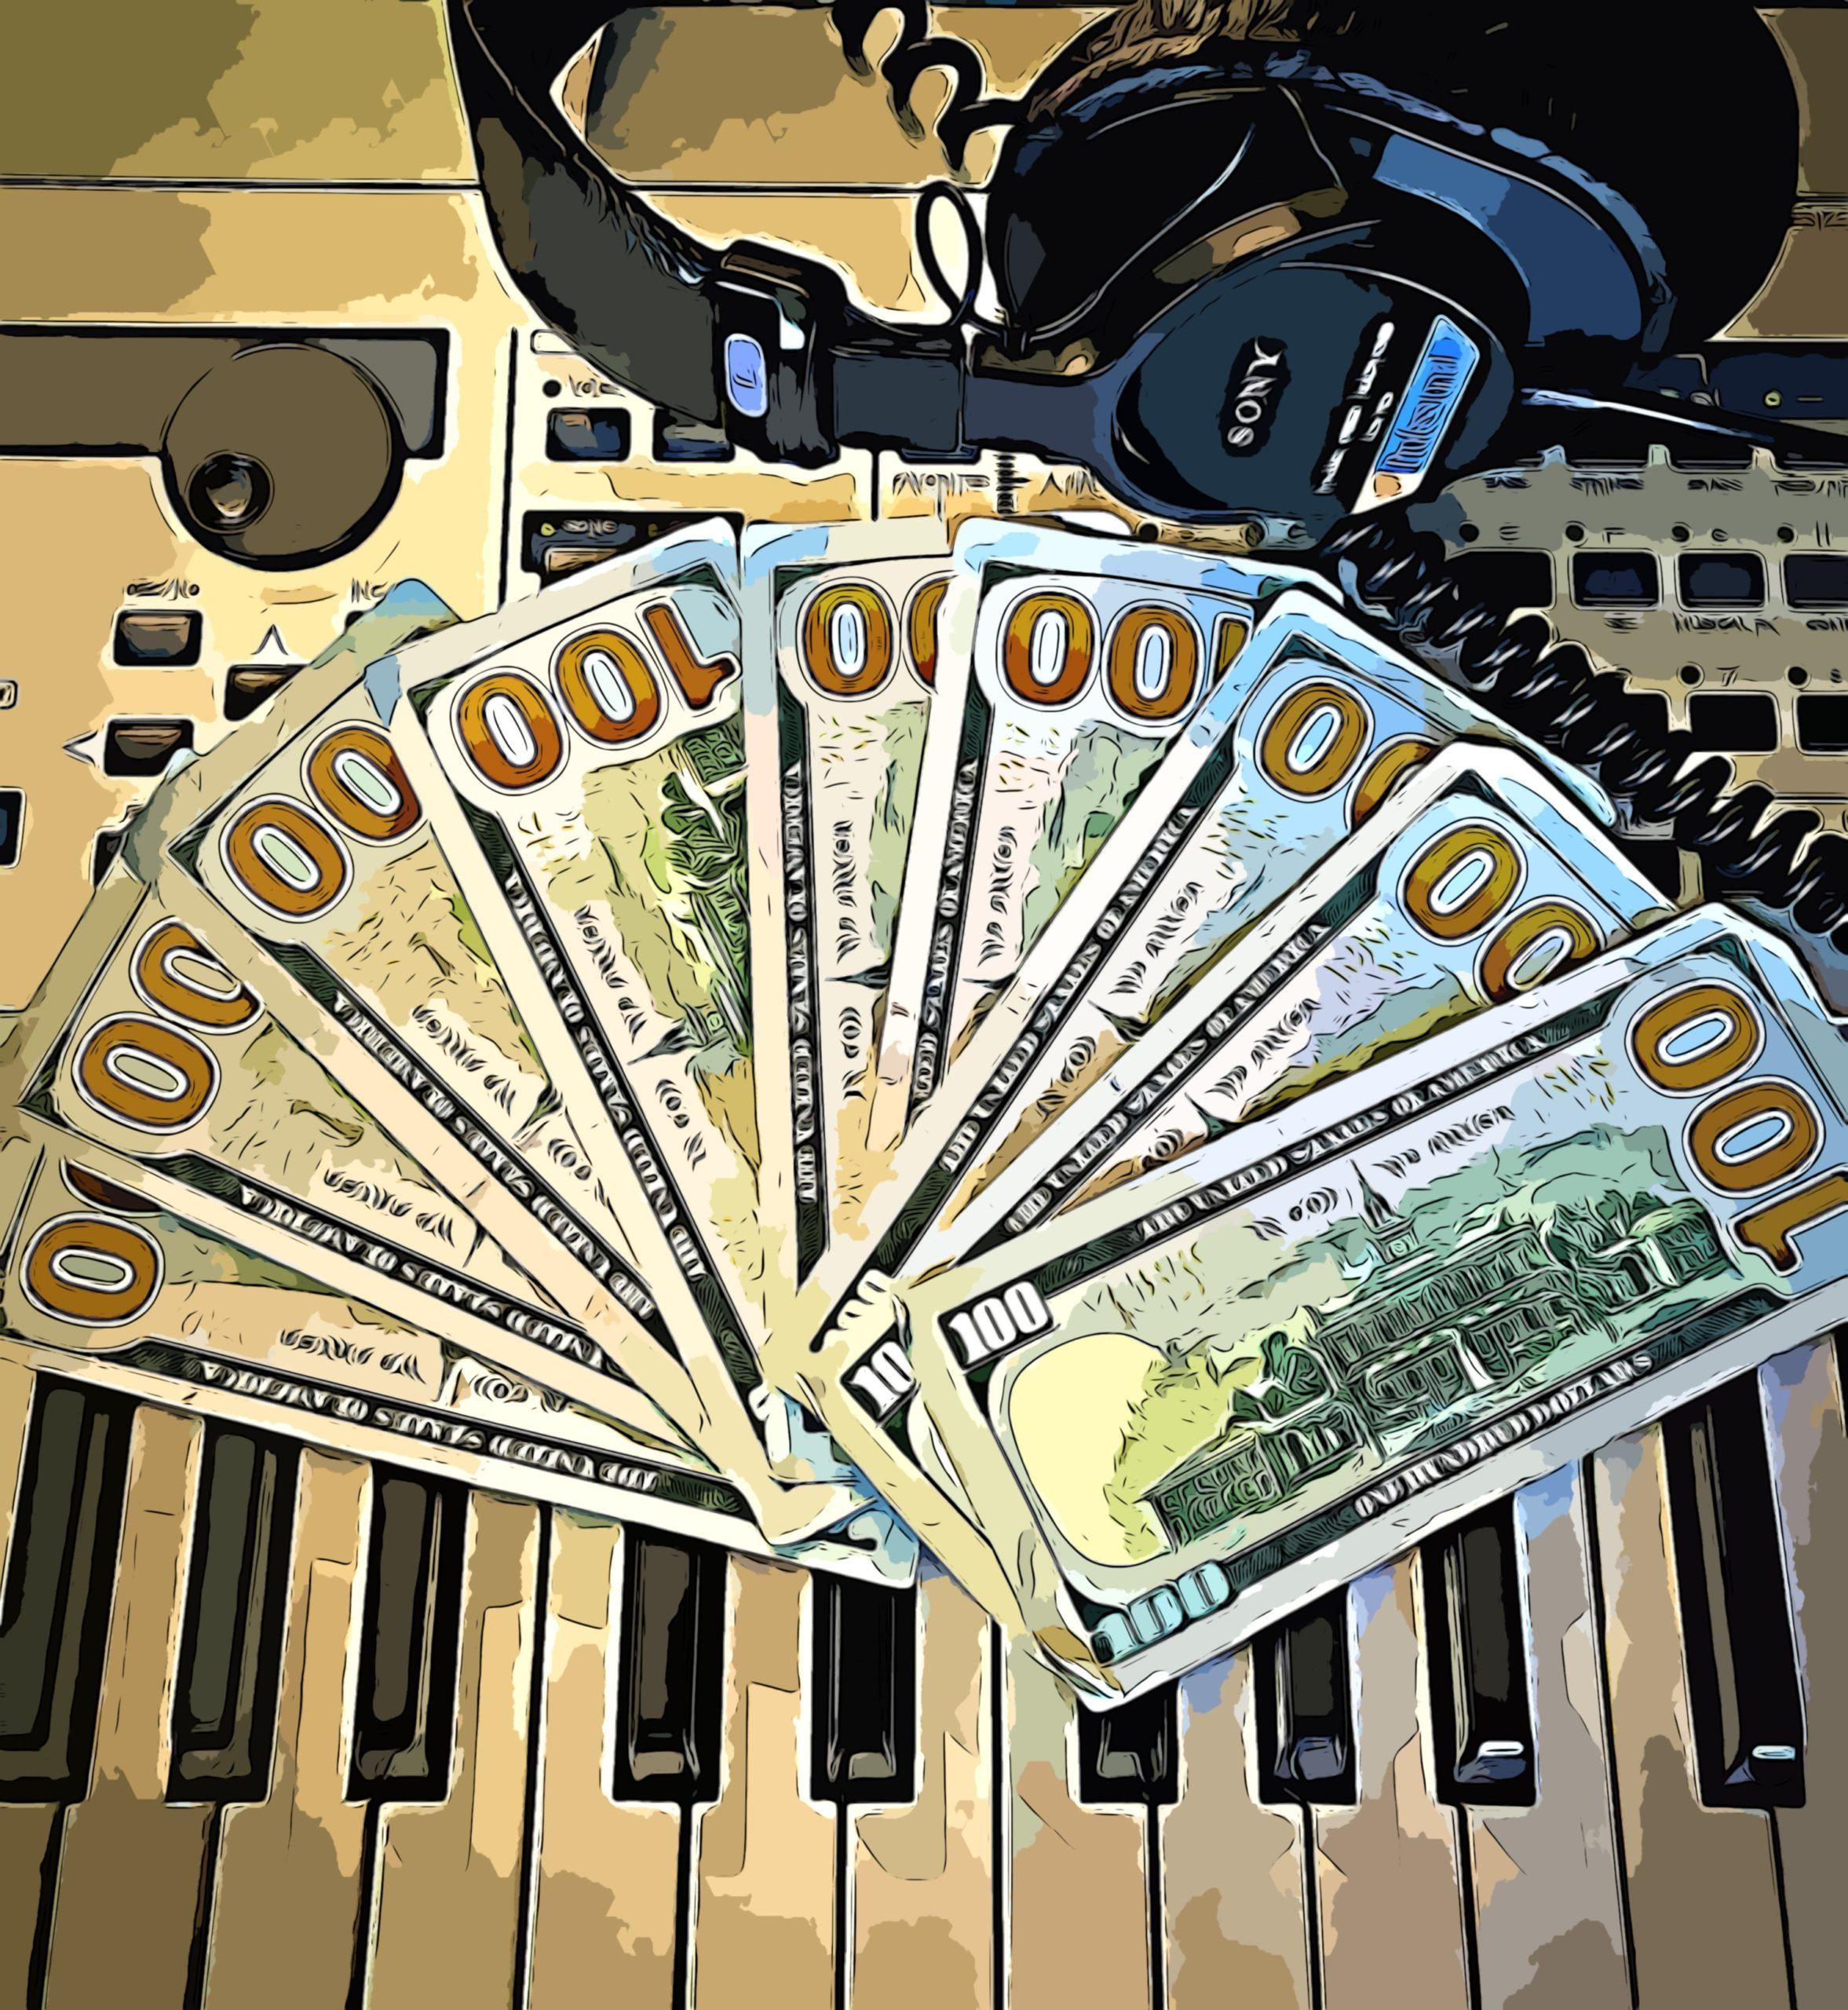 hundreds-of-for-music-CARTOONED